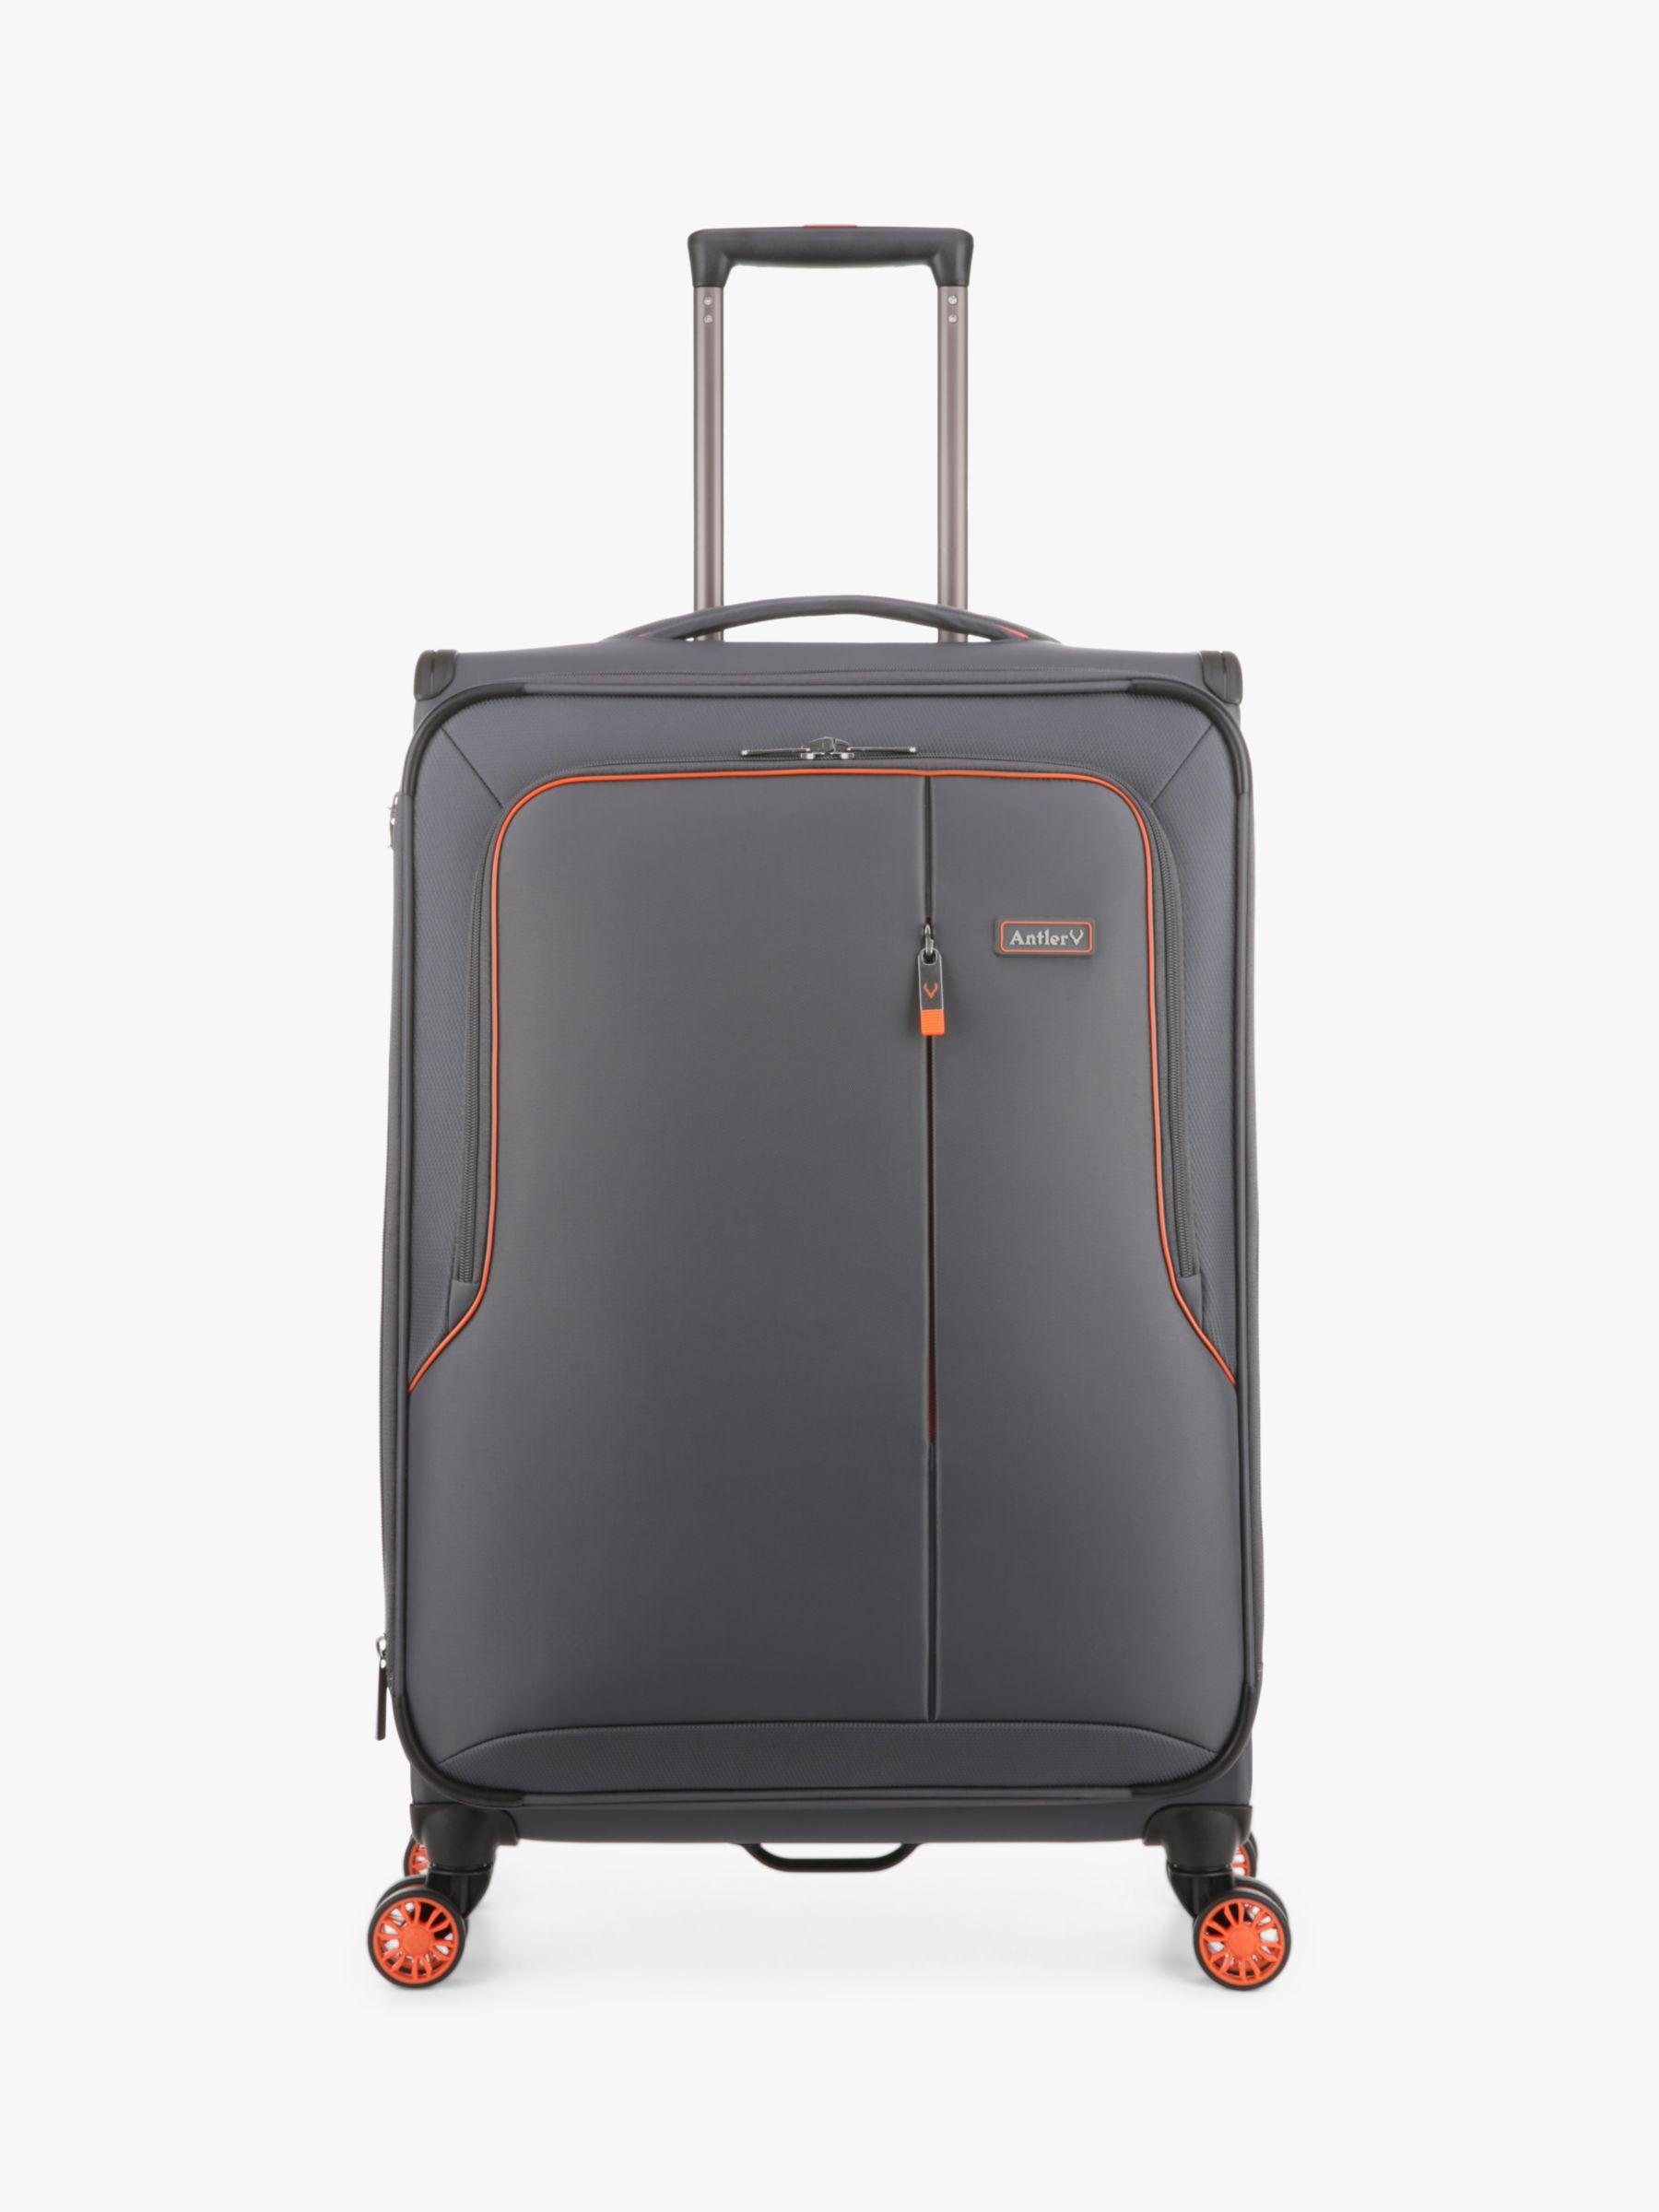 Antler Antler Clarendon 4-Wheel 70cm Medium Suitcase